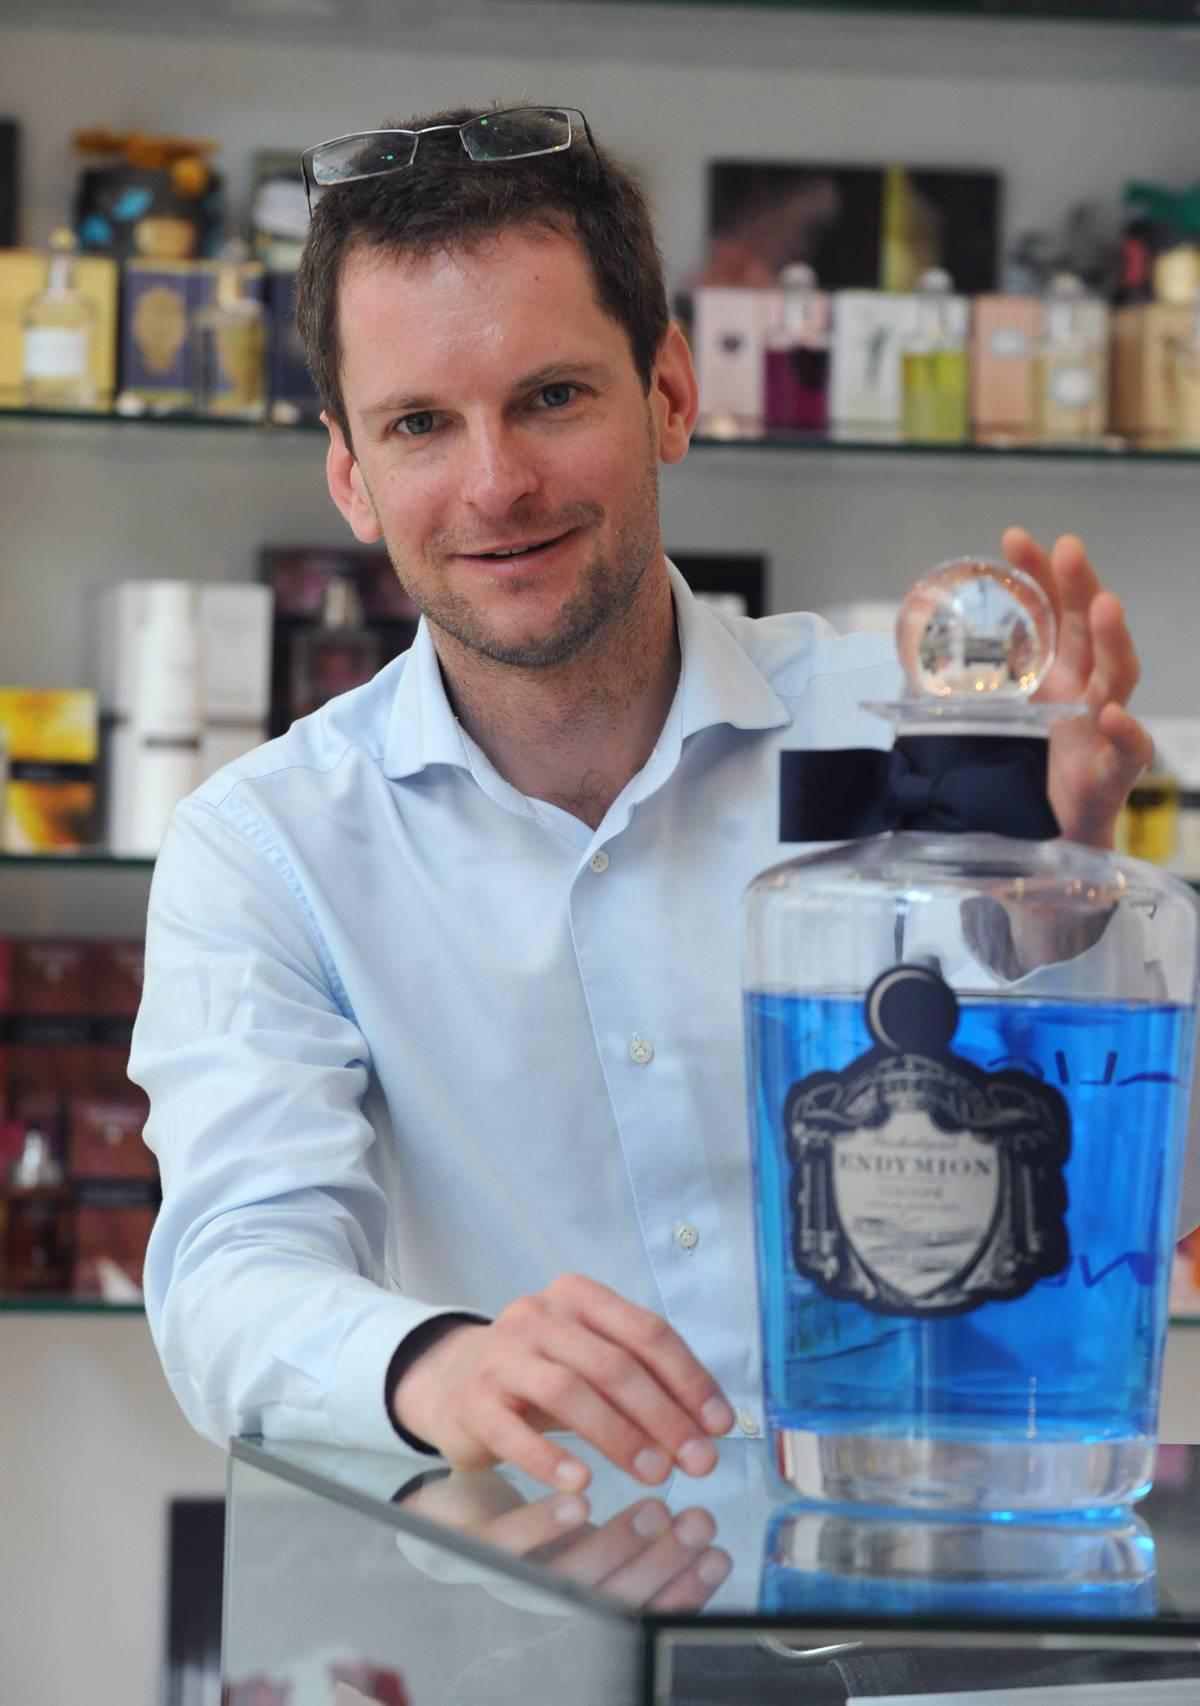 Interjú Zólyomi Zsolt parfümőrrel